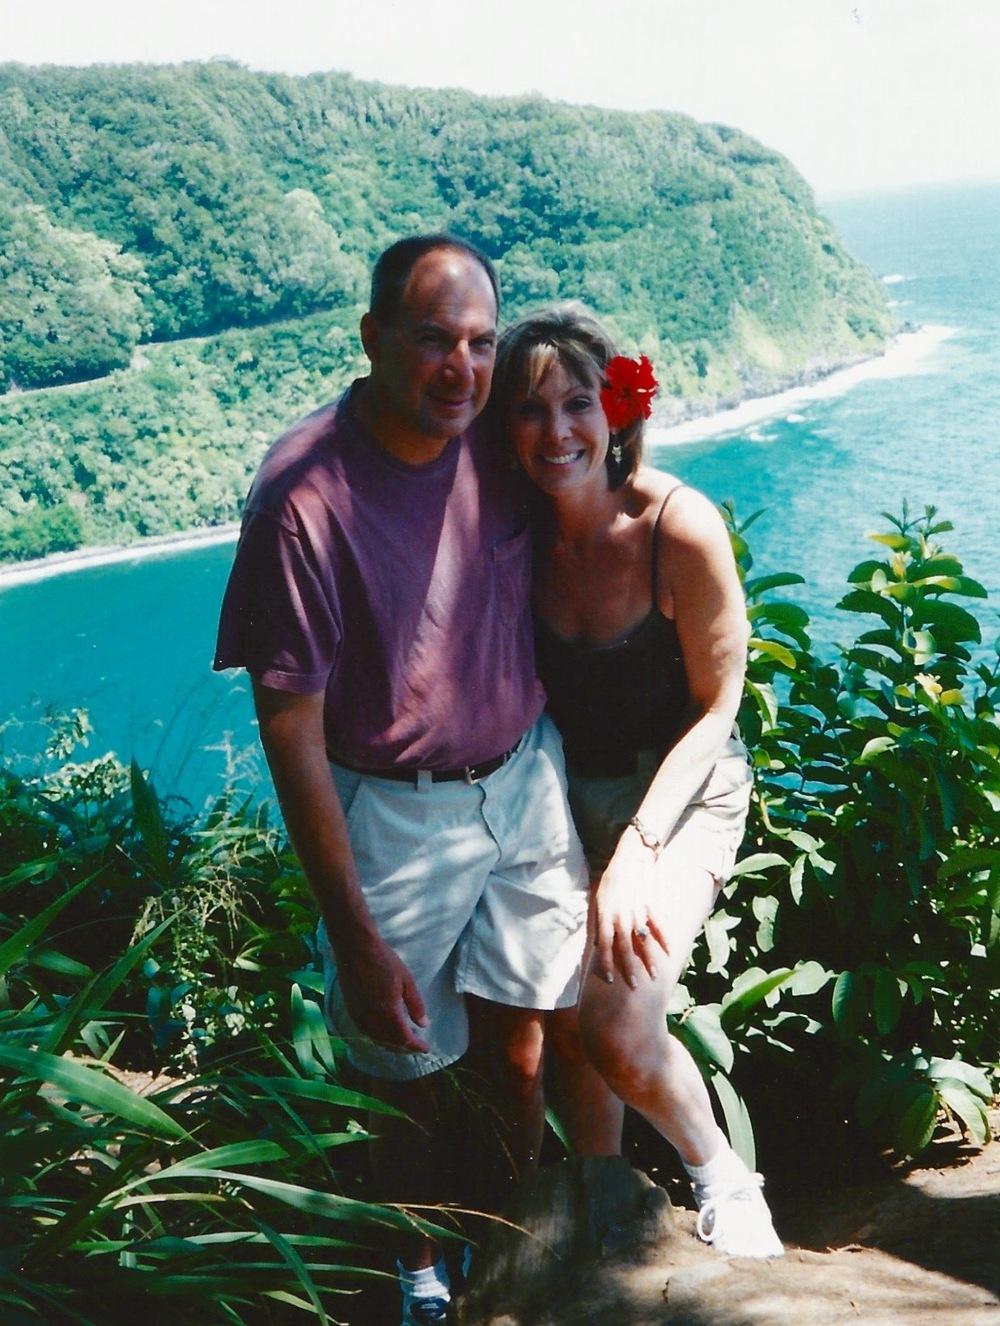 Maui, June 2005